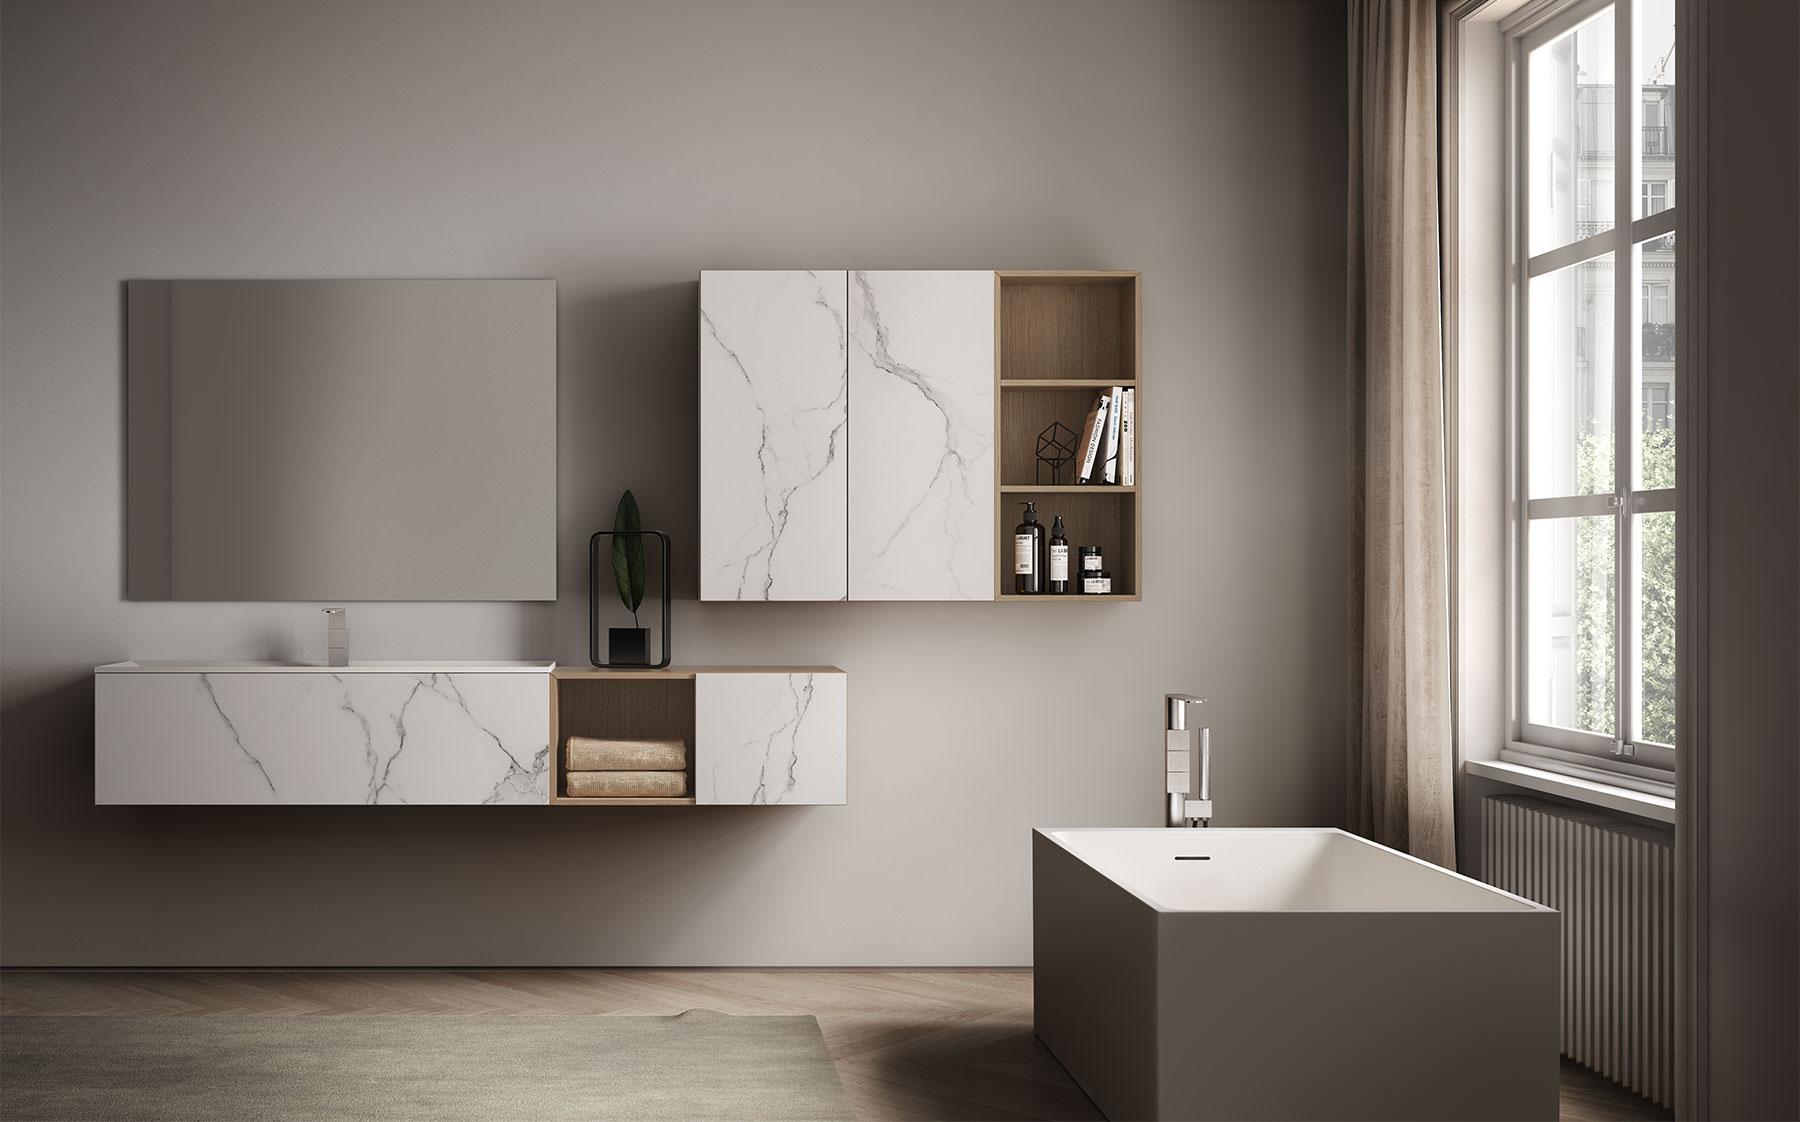 Arredo Bagno Ideagroup Prezzi.Dogma Modern Furniture For Luxury Bathrooms Ideagroup